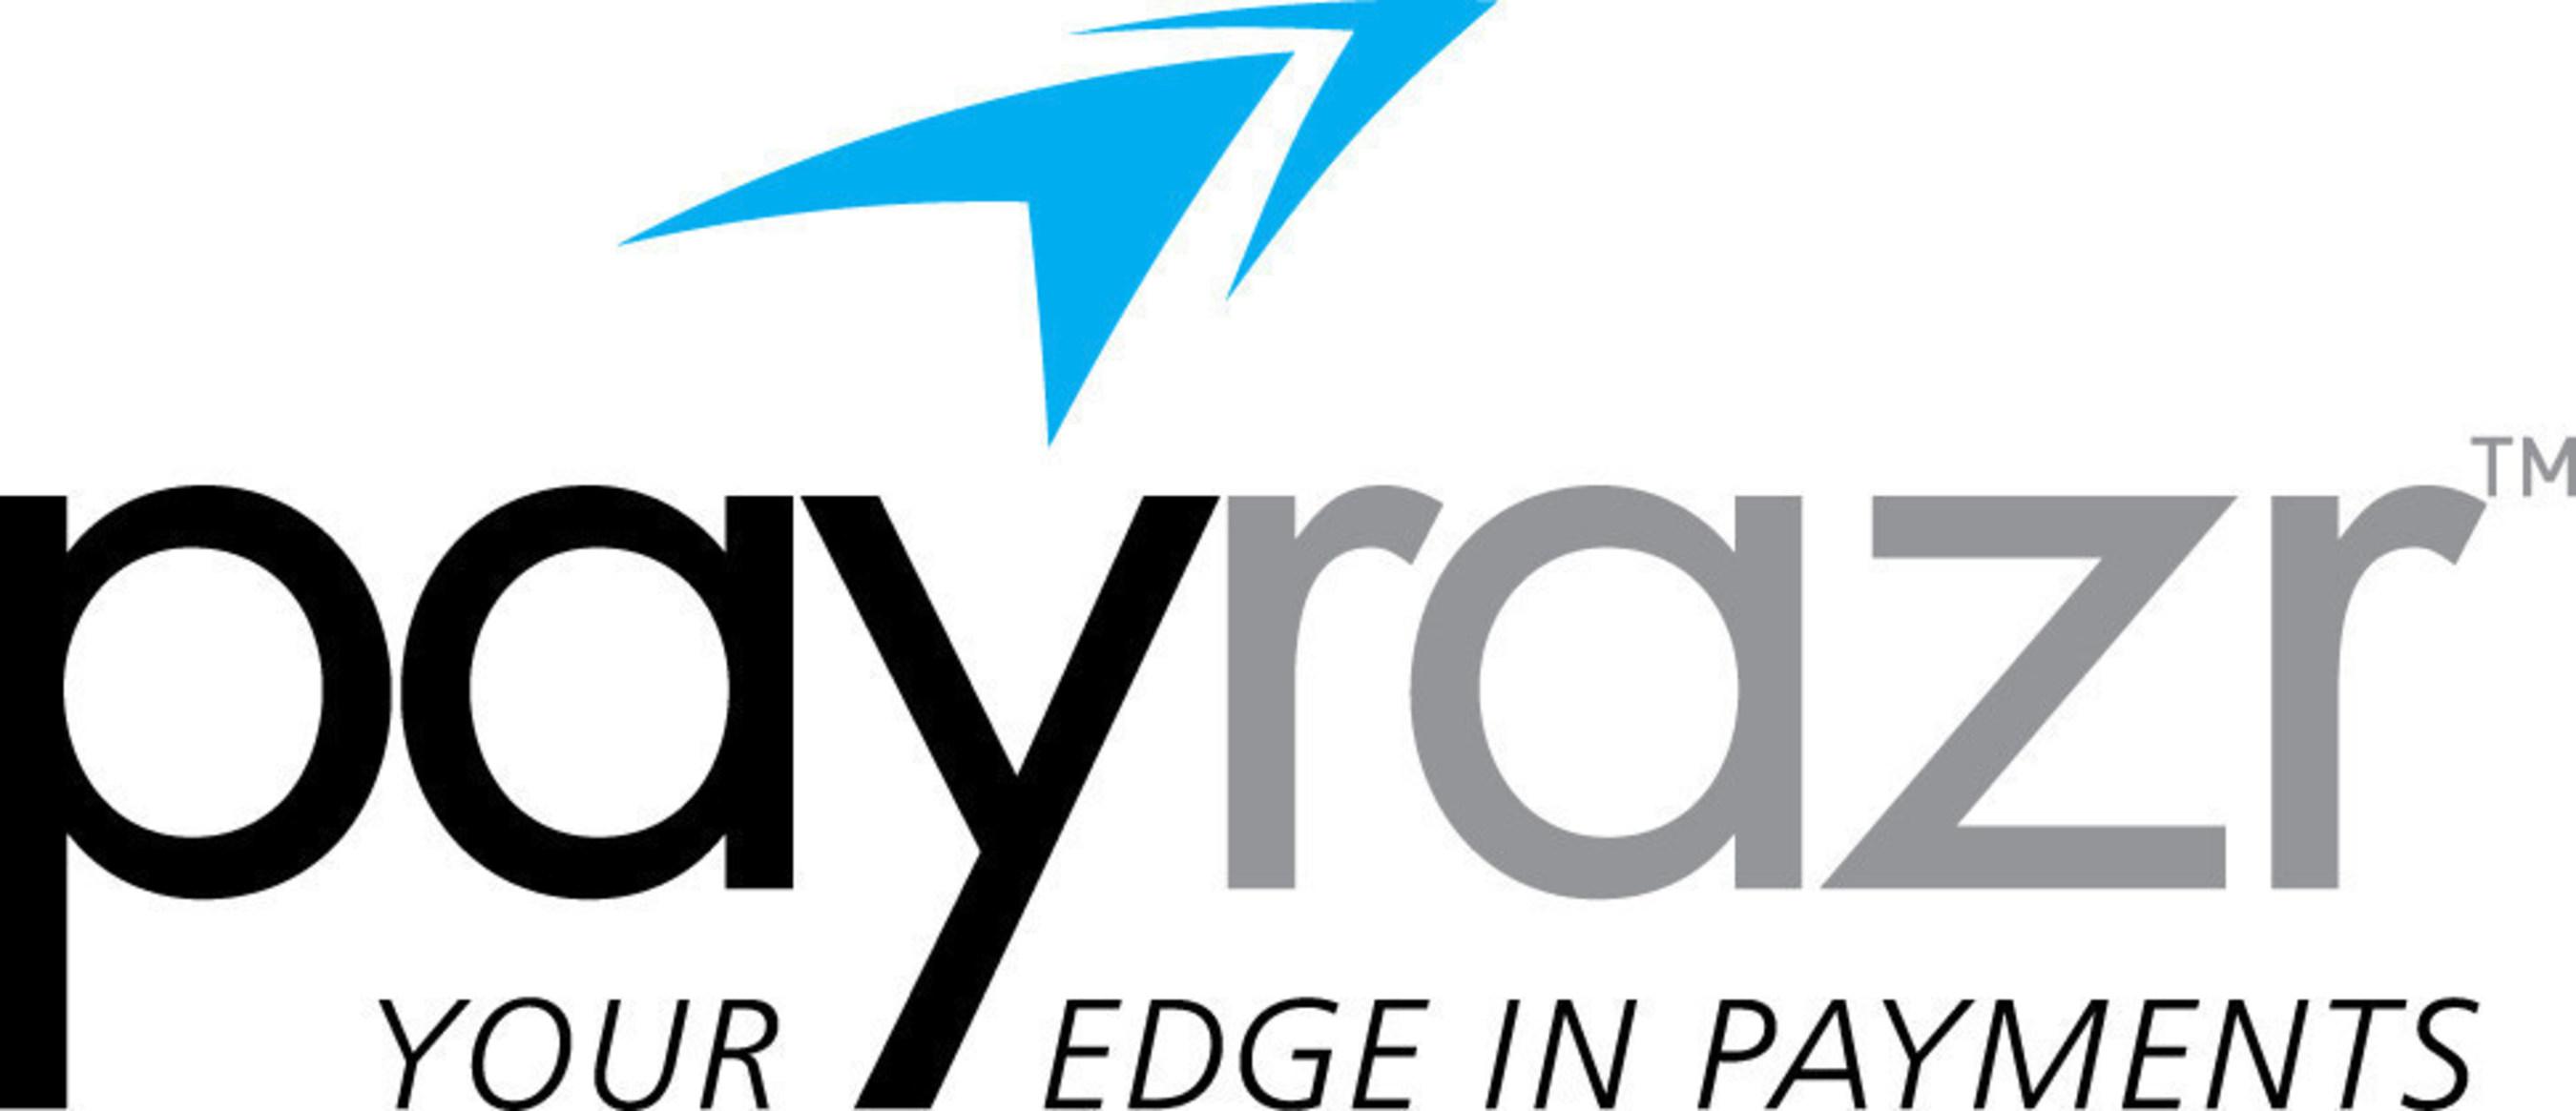 BillingTree's Payrazr www.payrazr.com